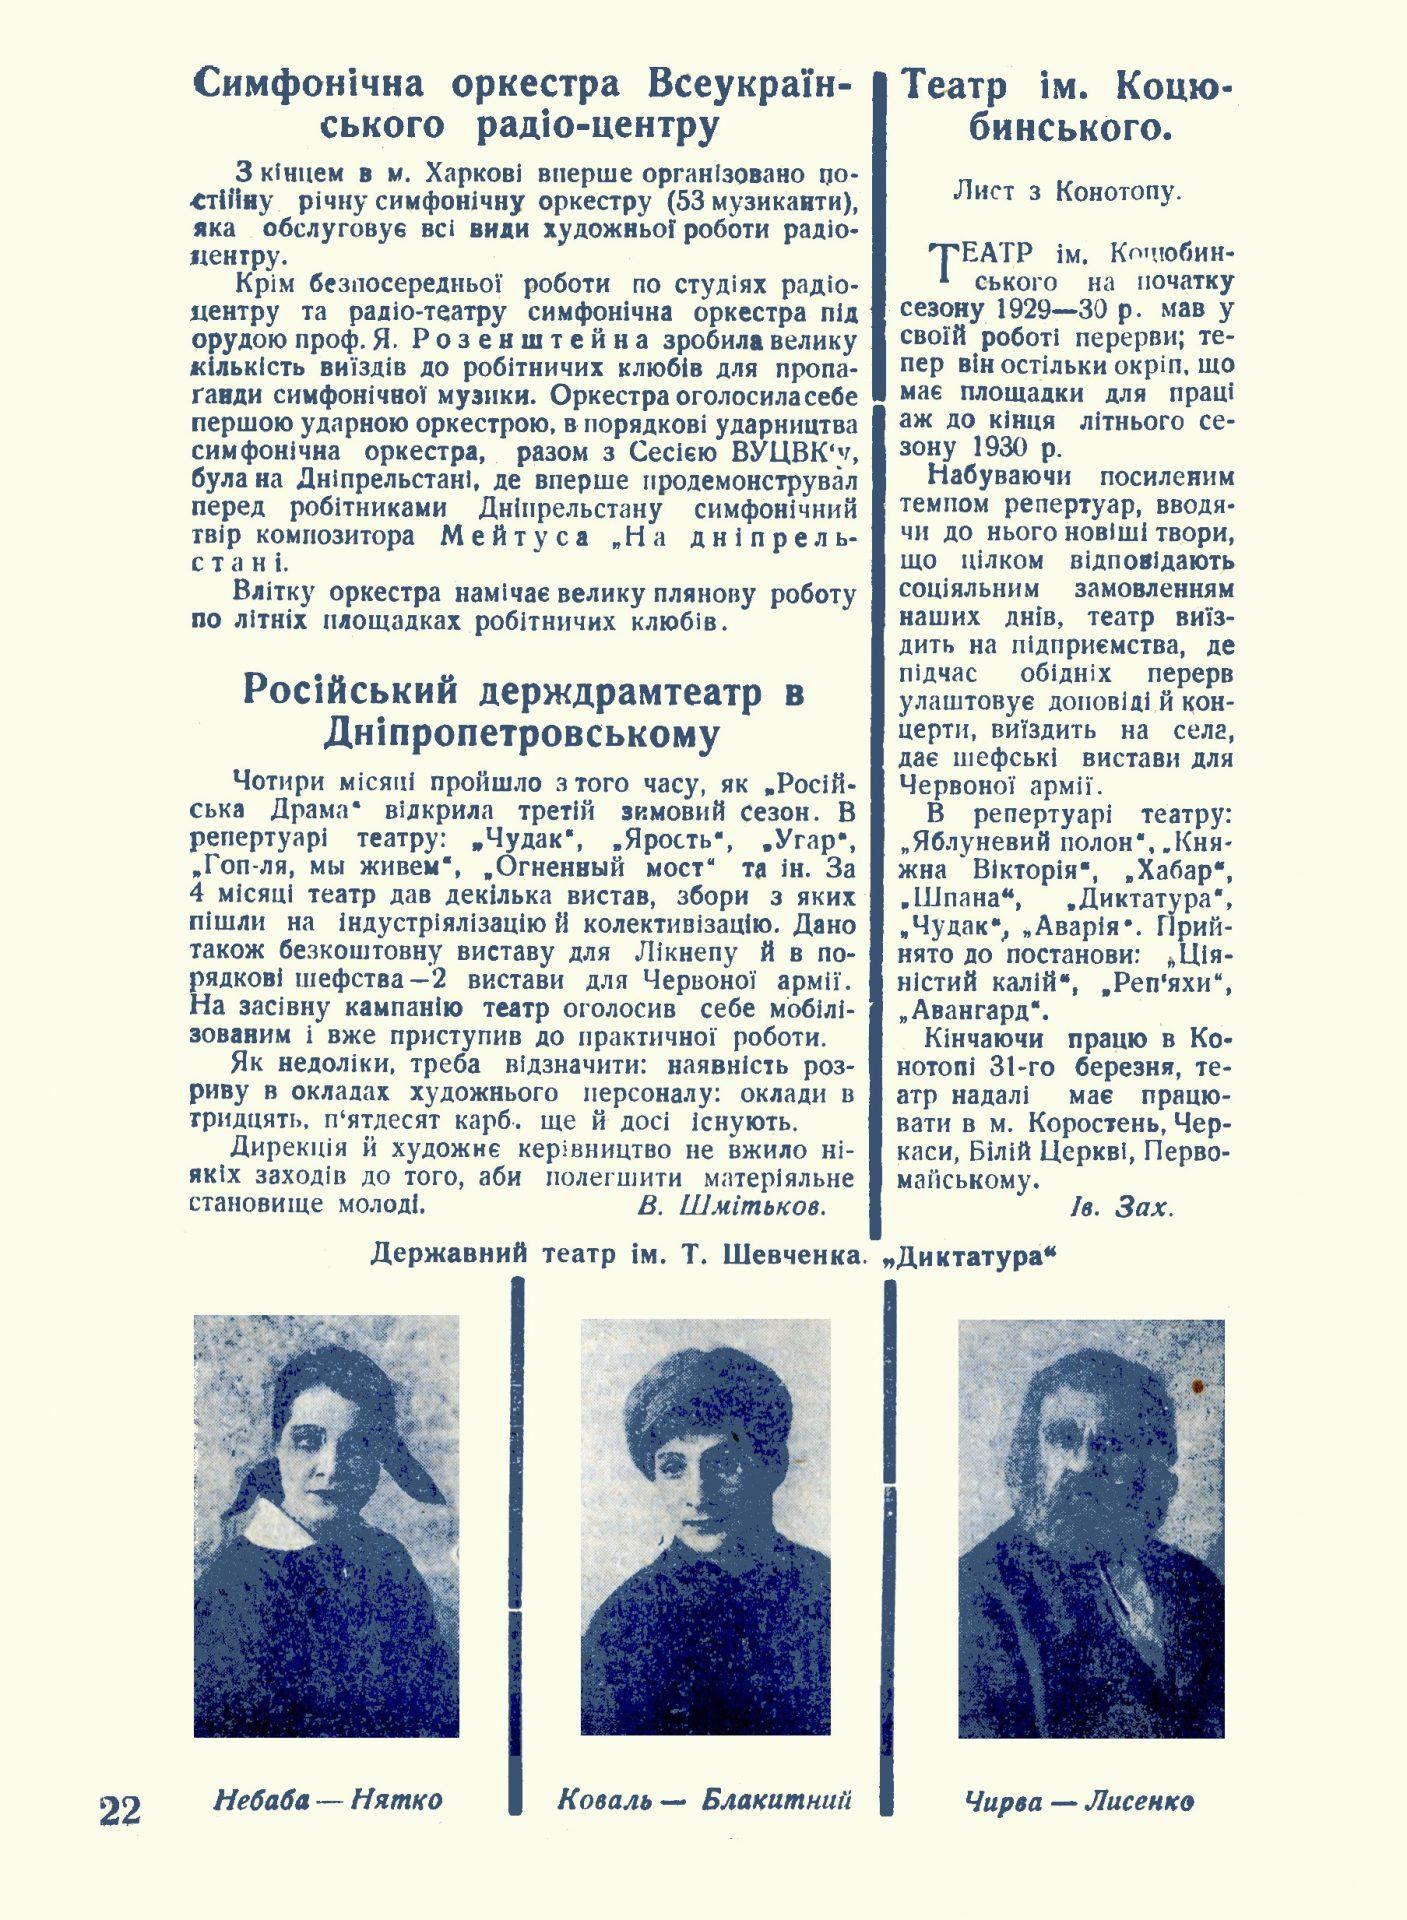 Мистецька трибуна_1930_№ 4